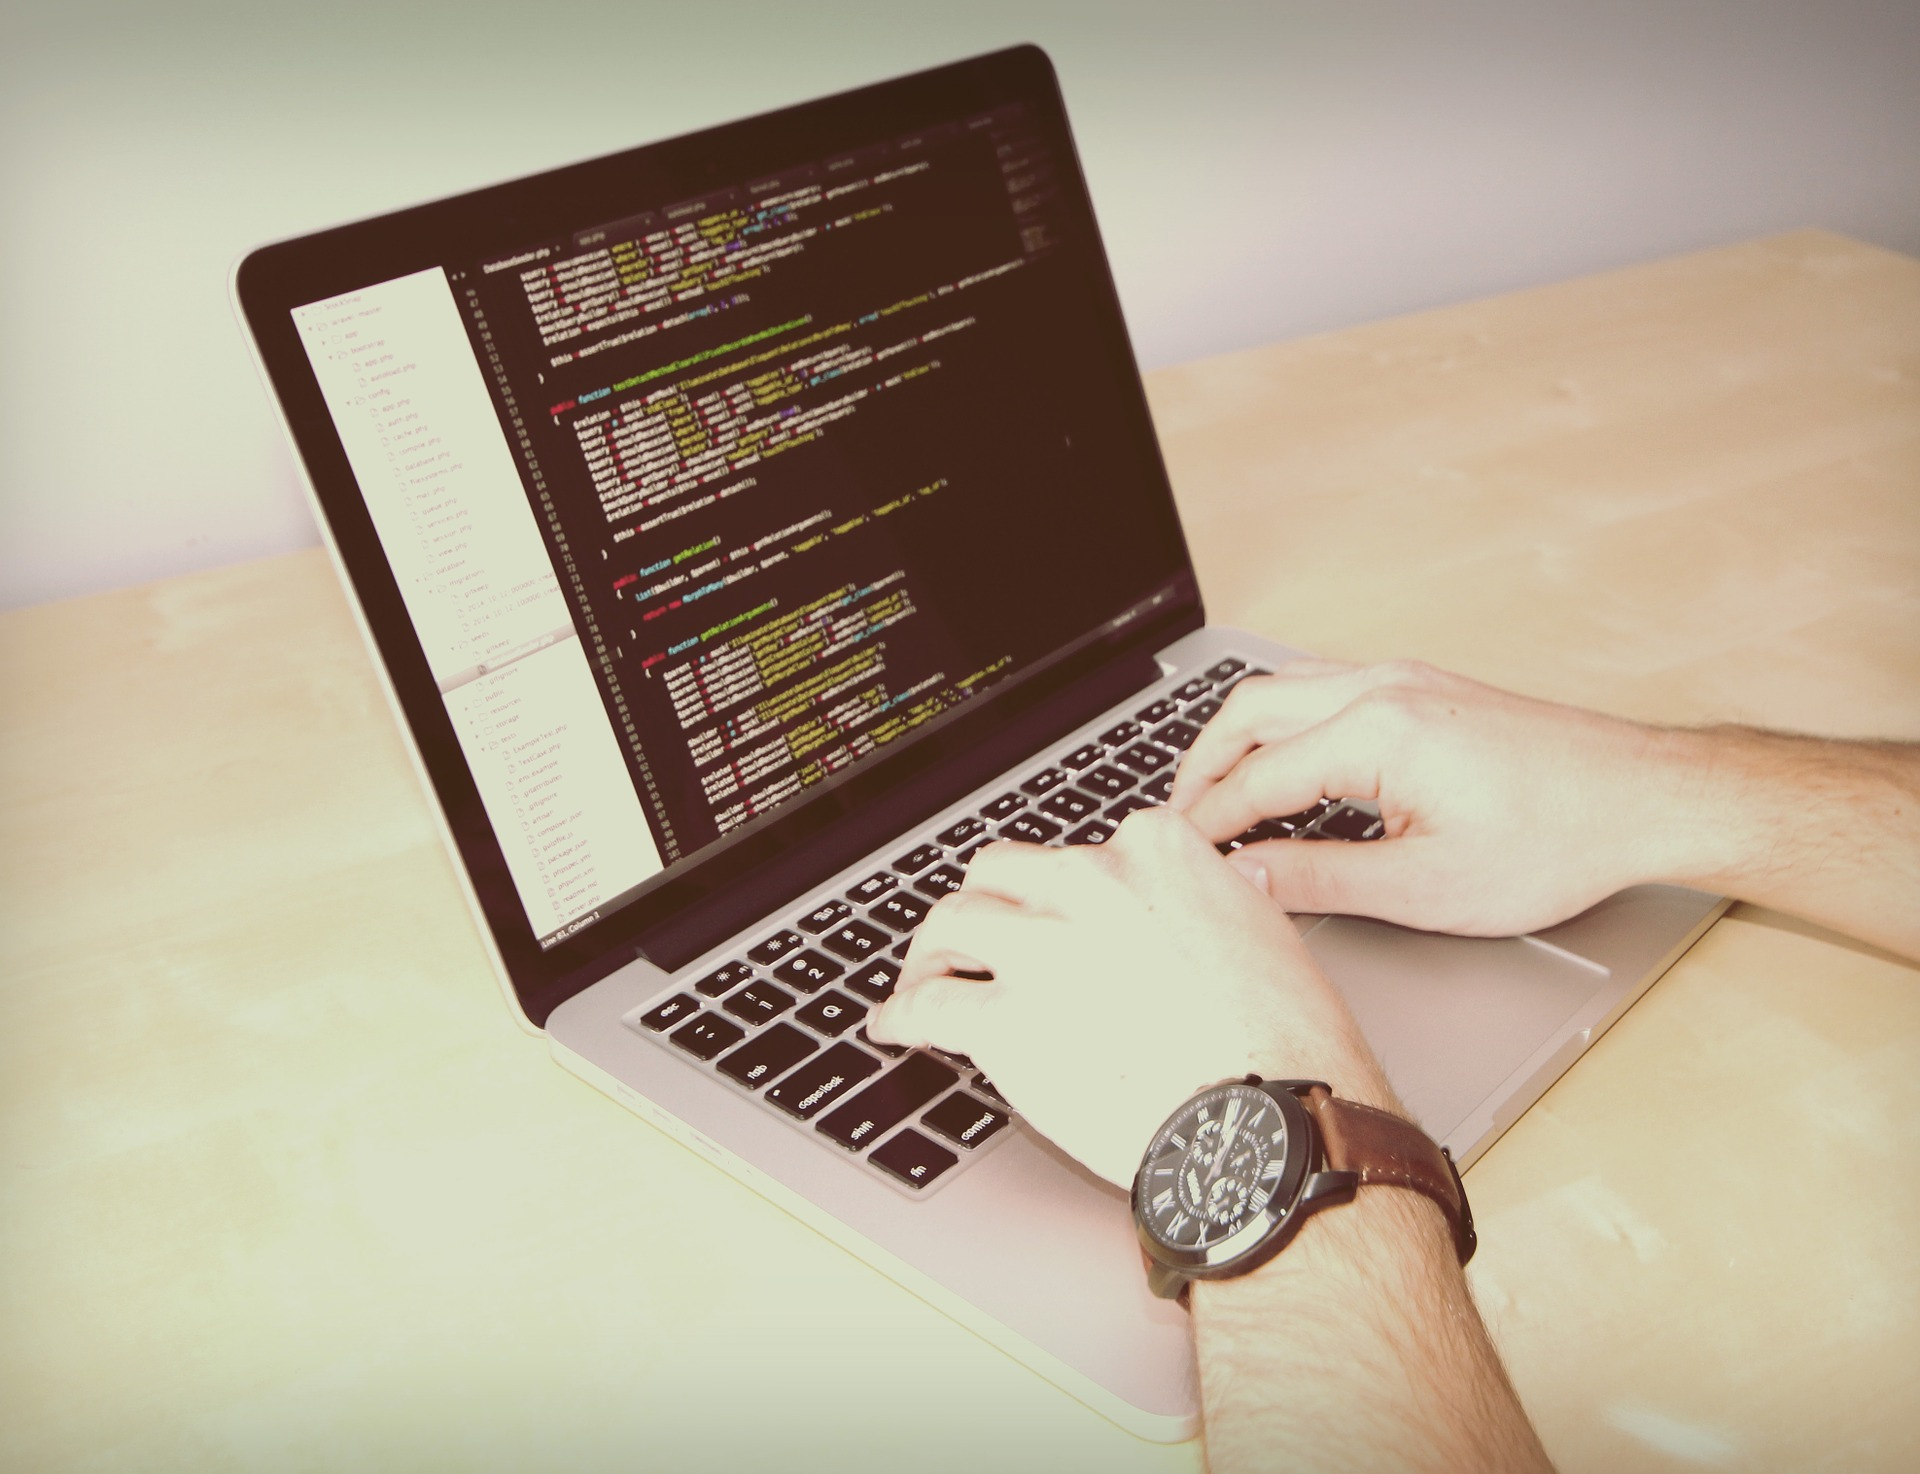 Як виглядає робота Ананда Пракаша - етичного хакера - news, people, career, story